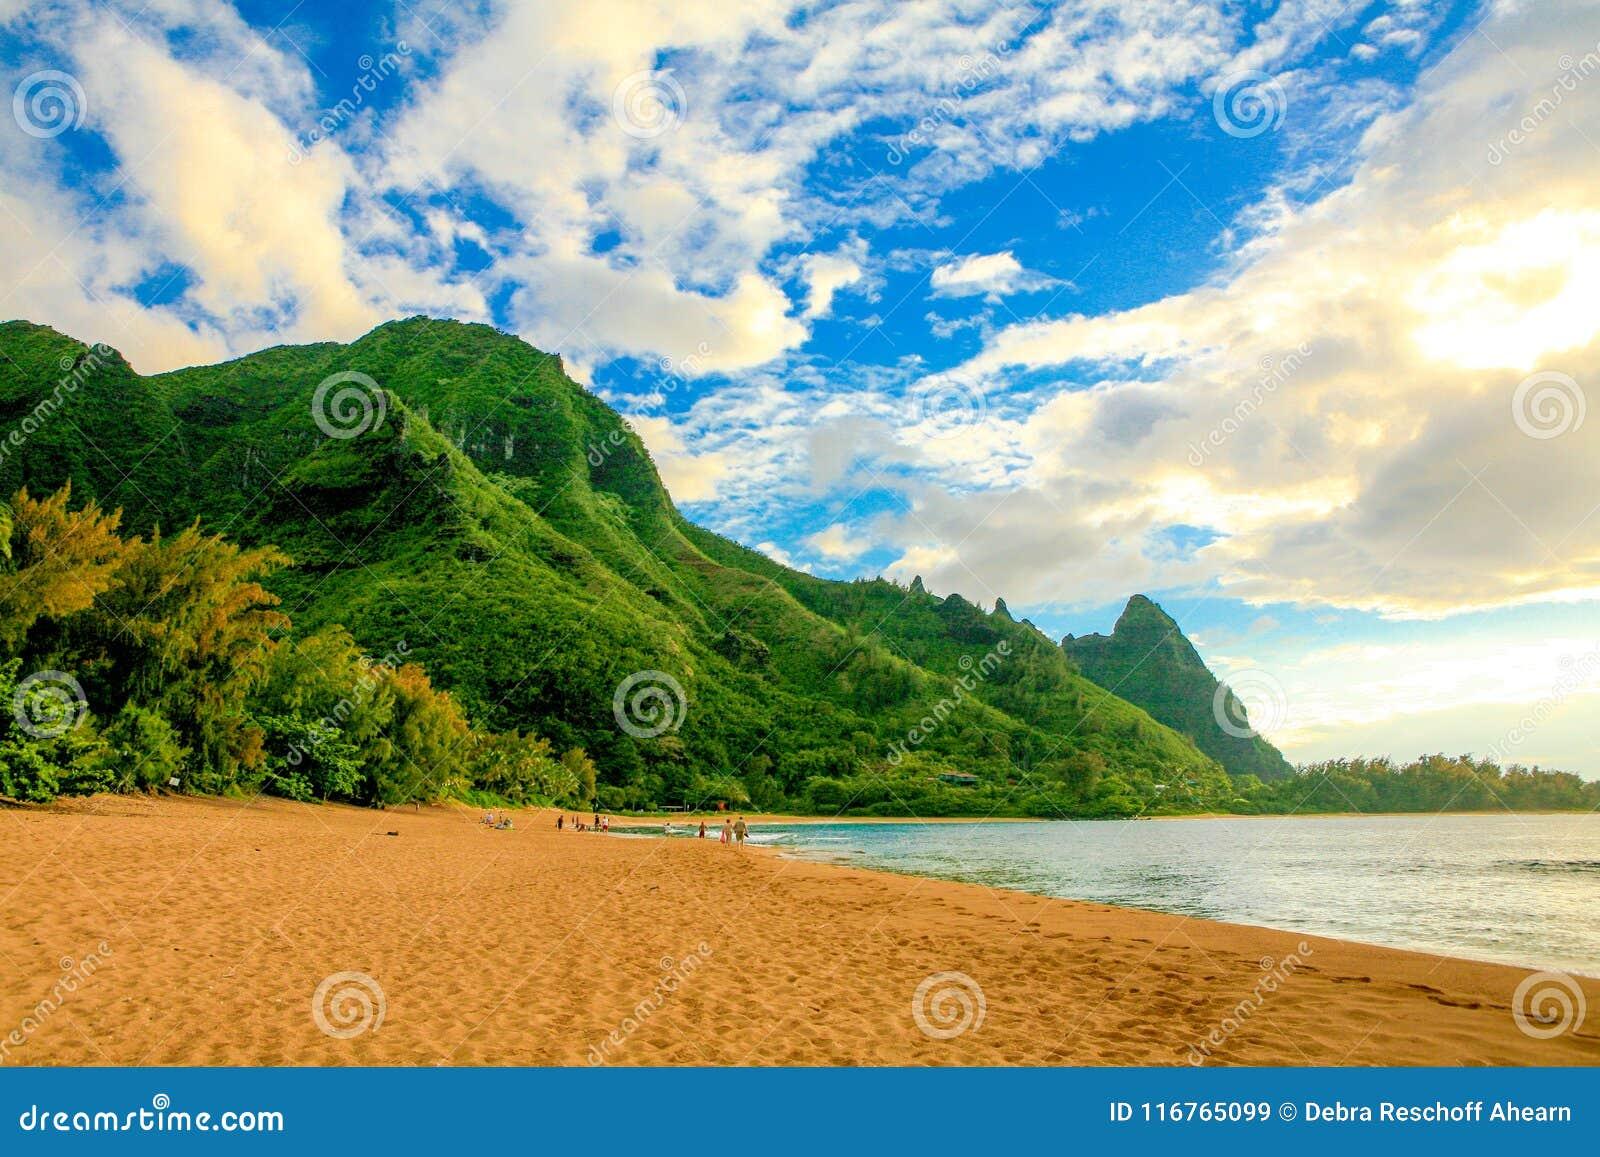 Where Is Bali Hai Island tunnels beach, with makana mountain or bali hai stock image